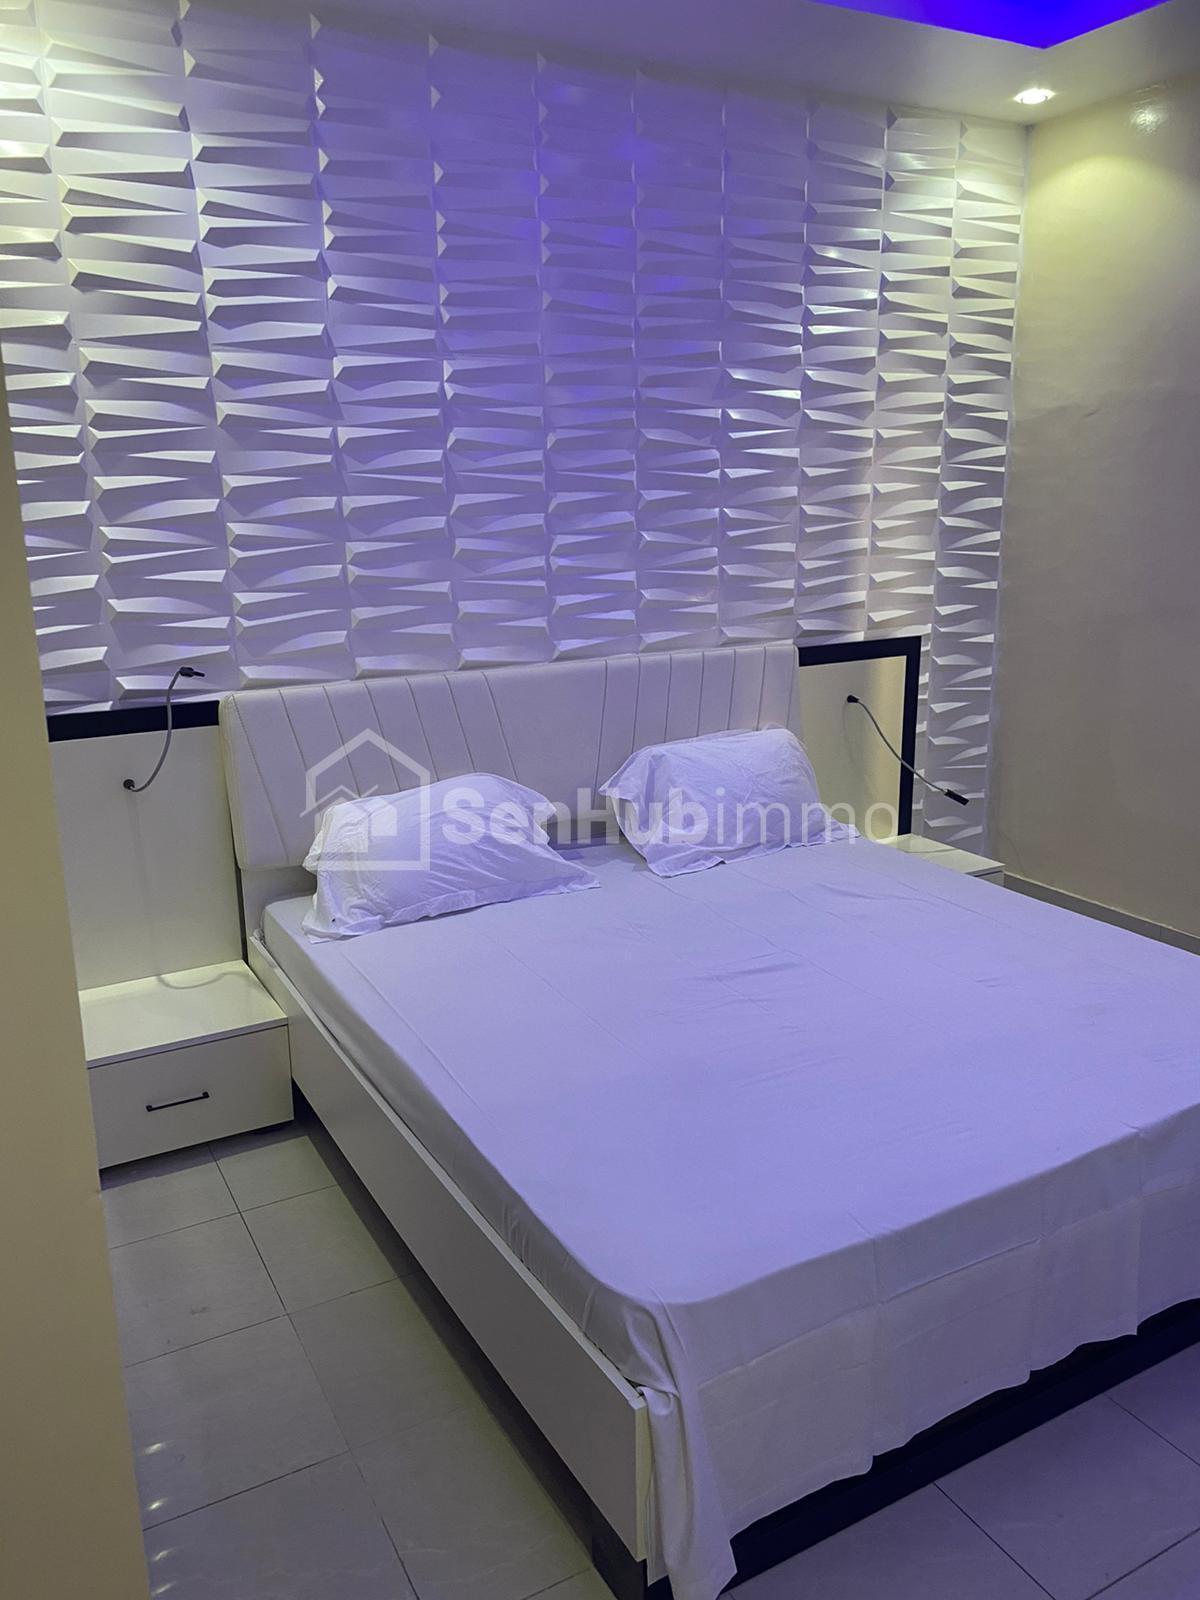 Chambre meublée à louer à Dieupeul - SenhubImmo.com